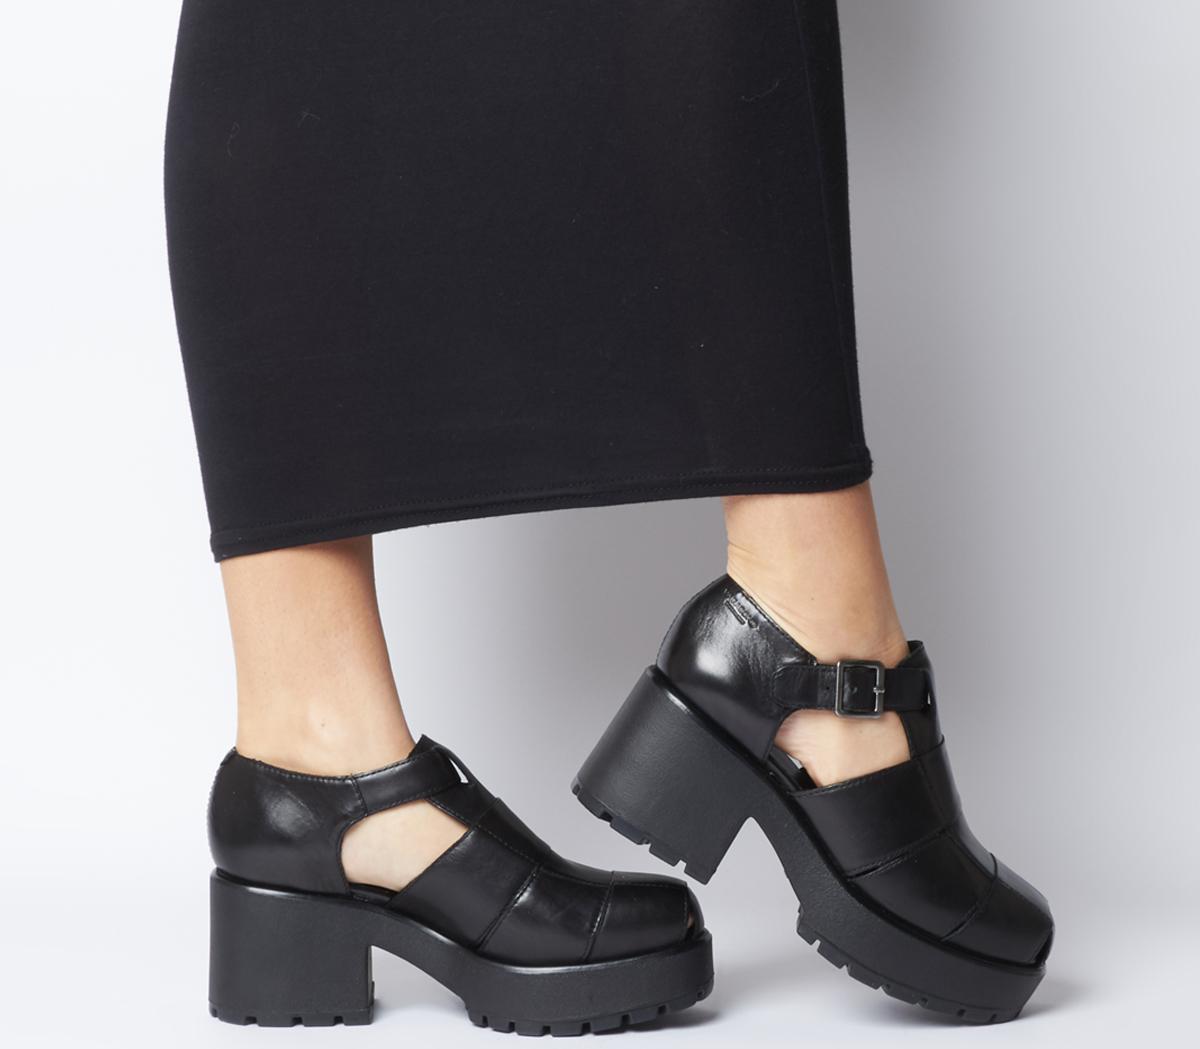 Dioon Block Sandals